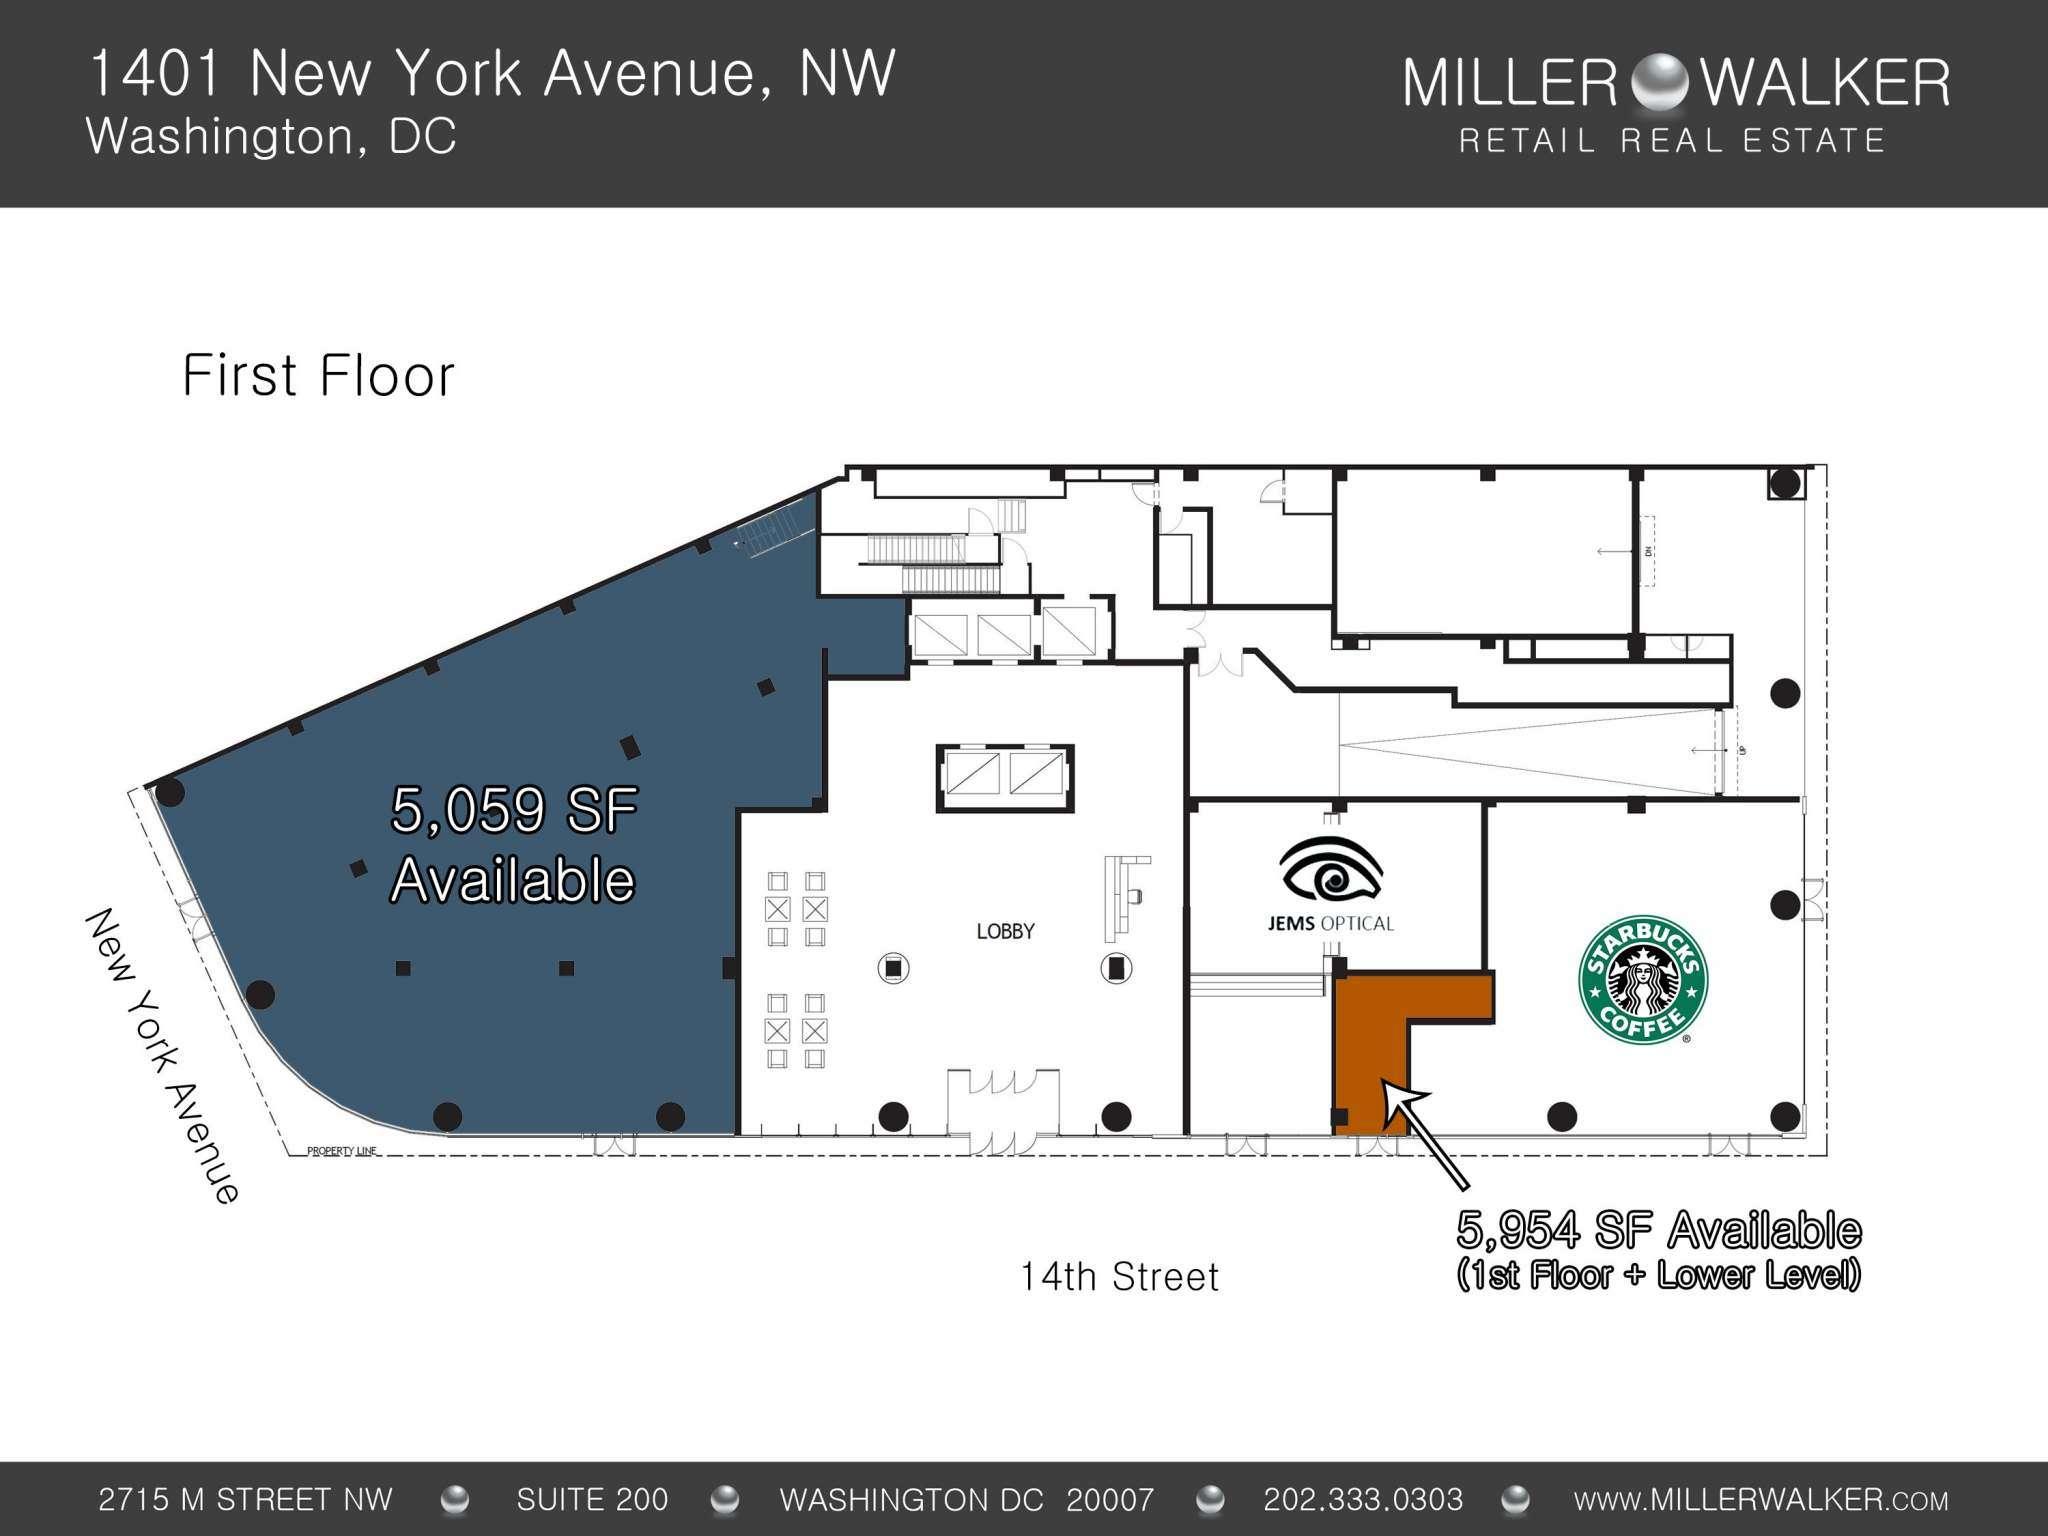 1401-new-york-avenue-floor-plans-9-30-2016_page_1